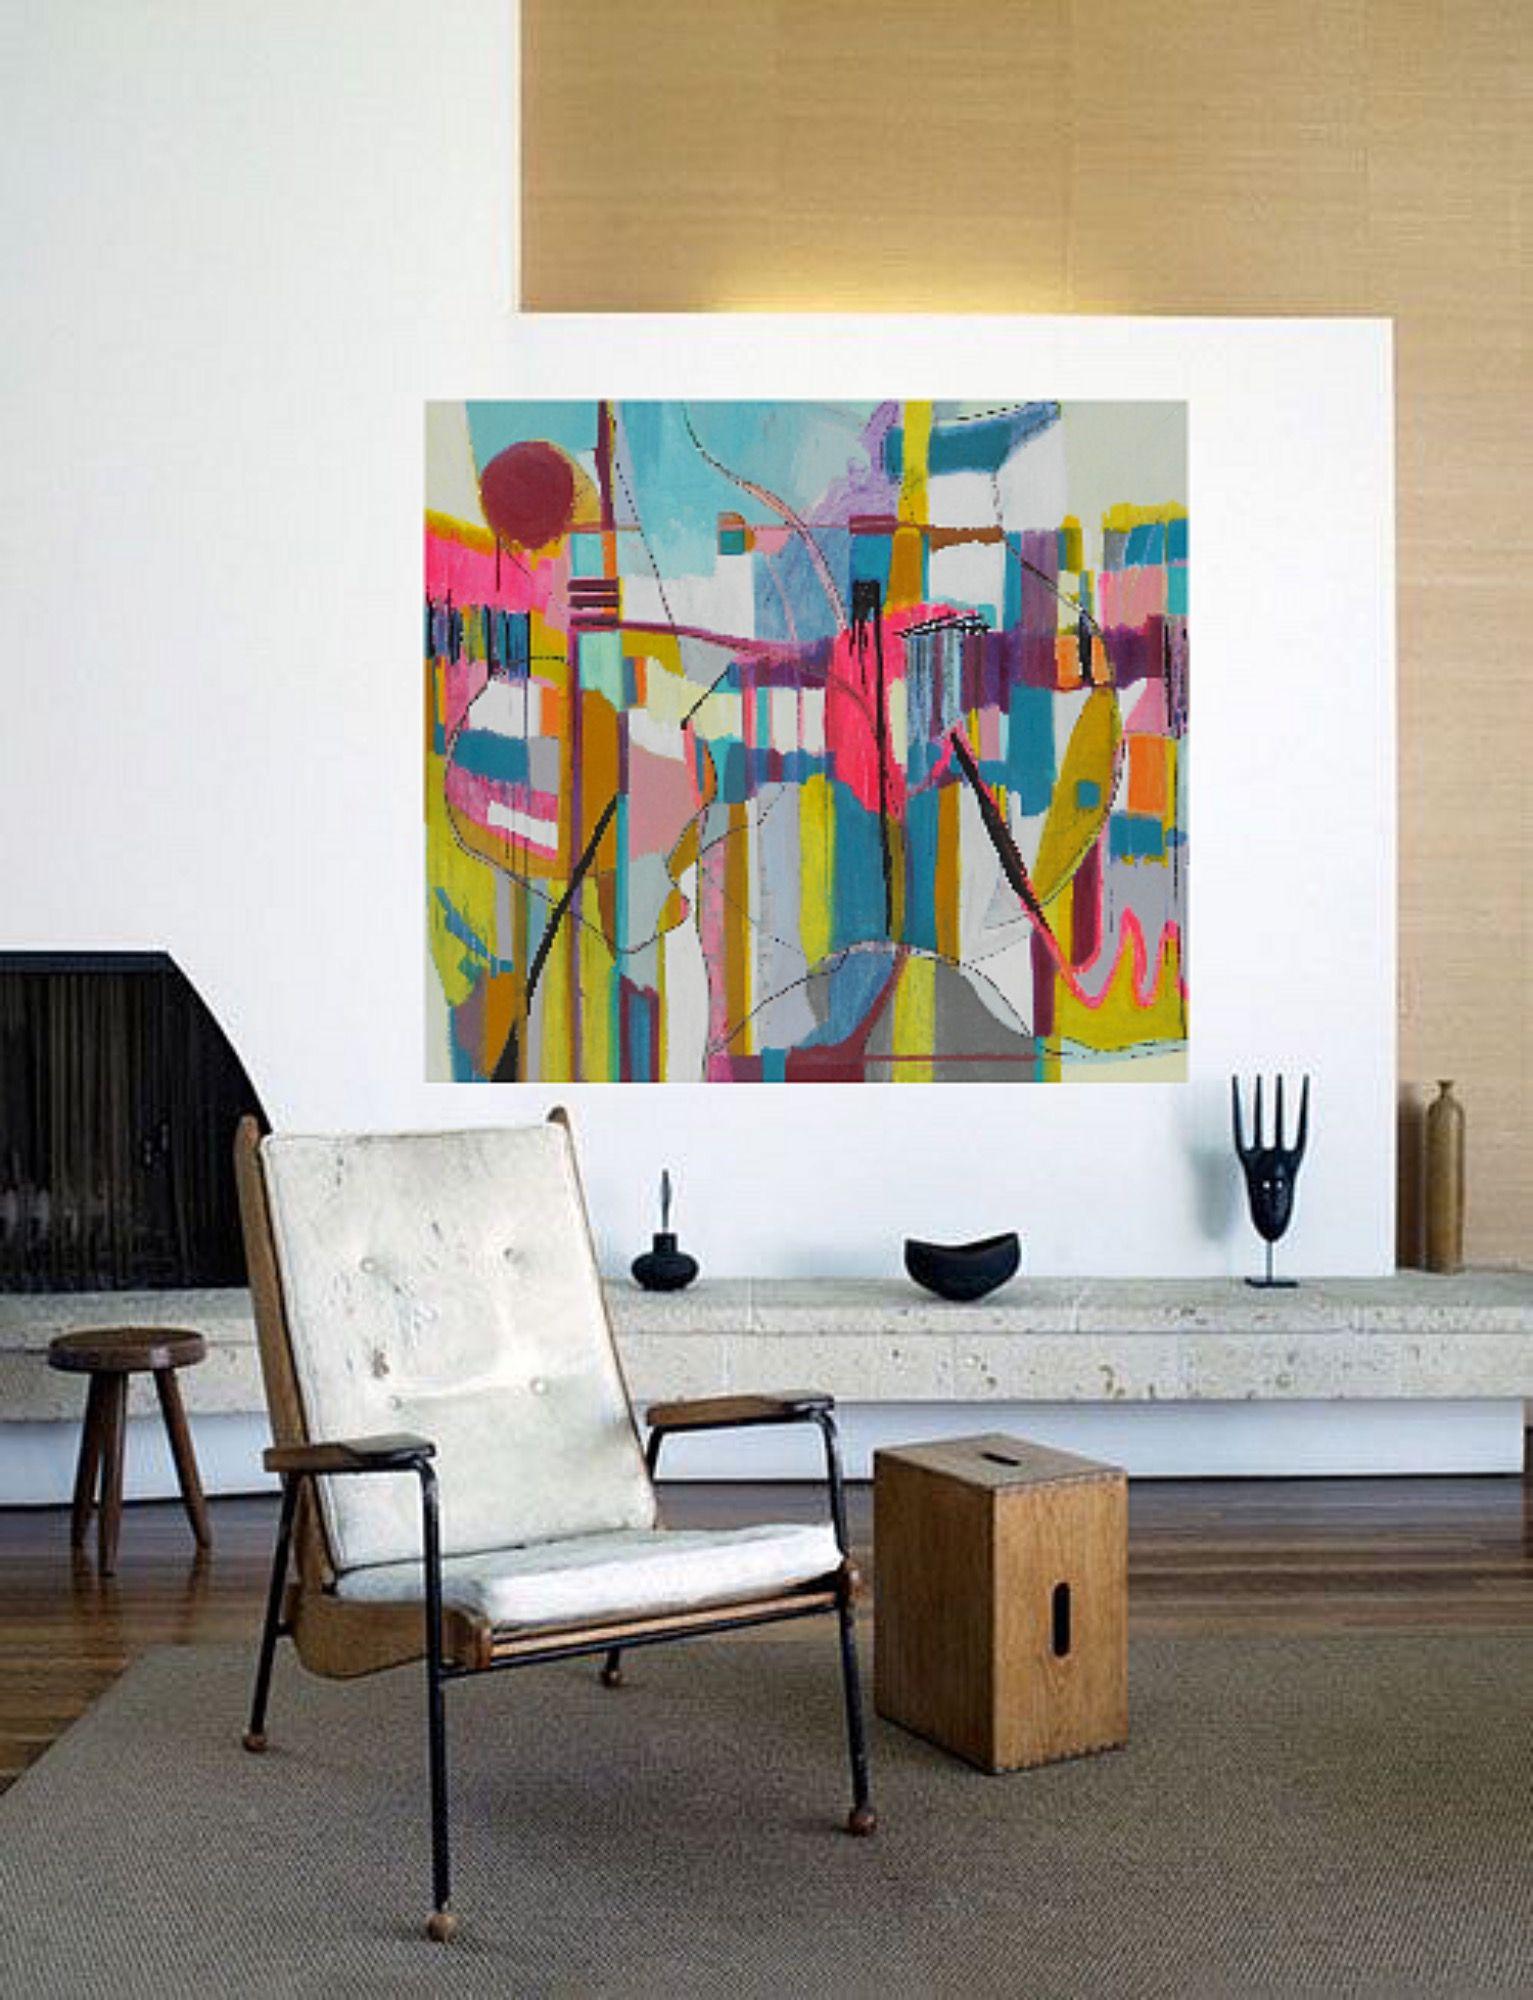 Artwork By Danielle Nelisse Contemporary Abstract Art Abstract Art Painting Art Painting